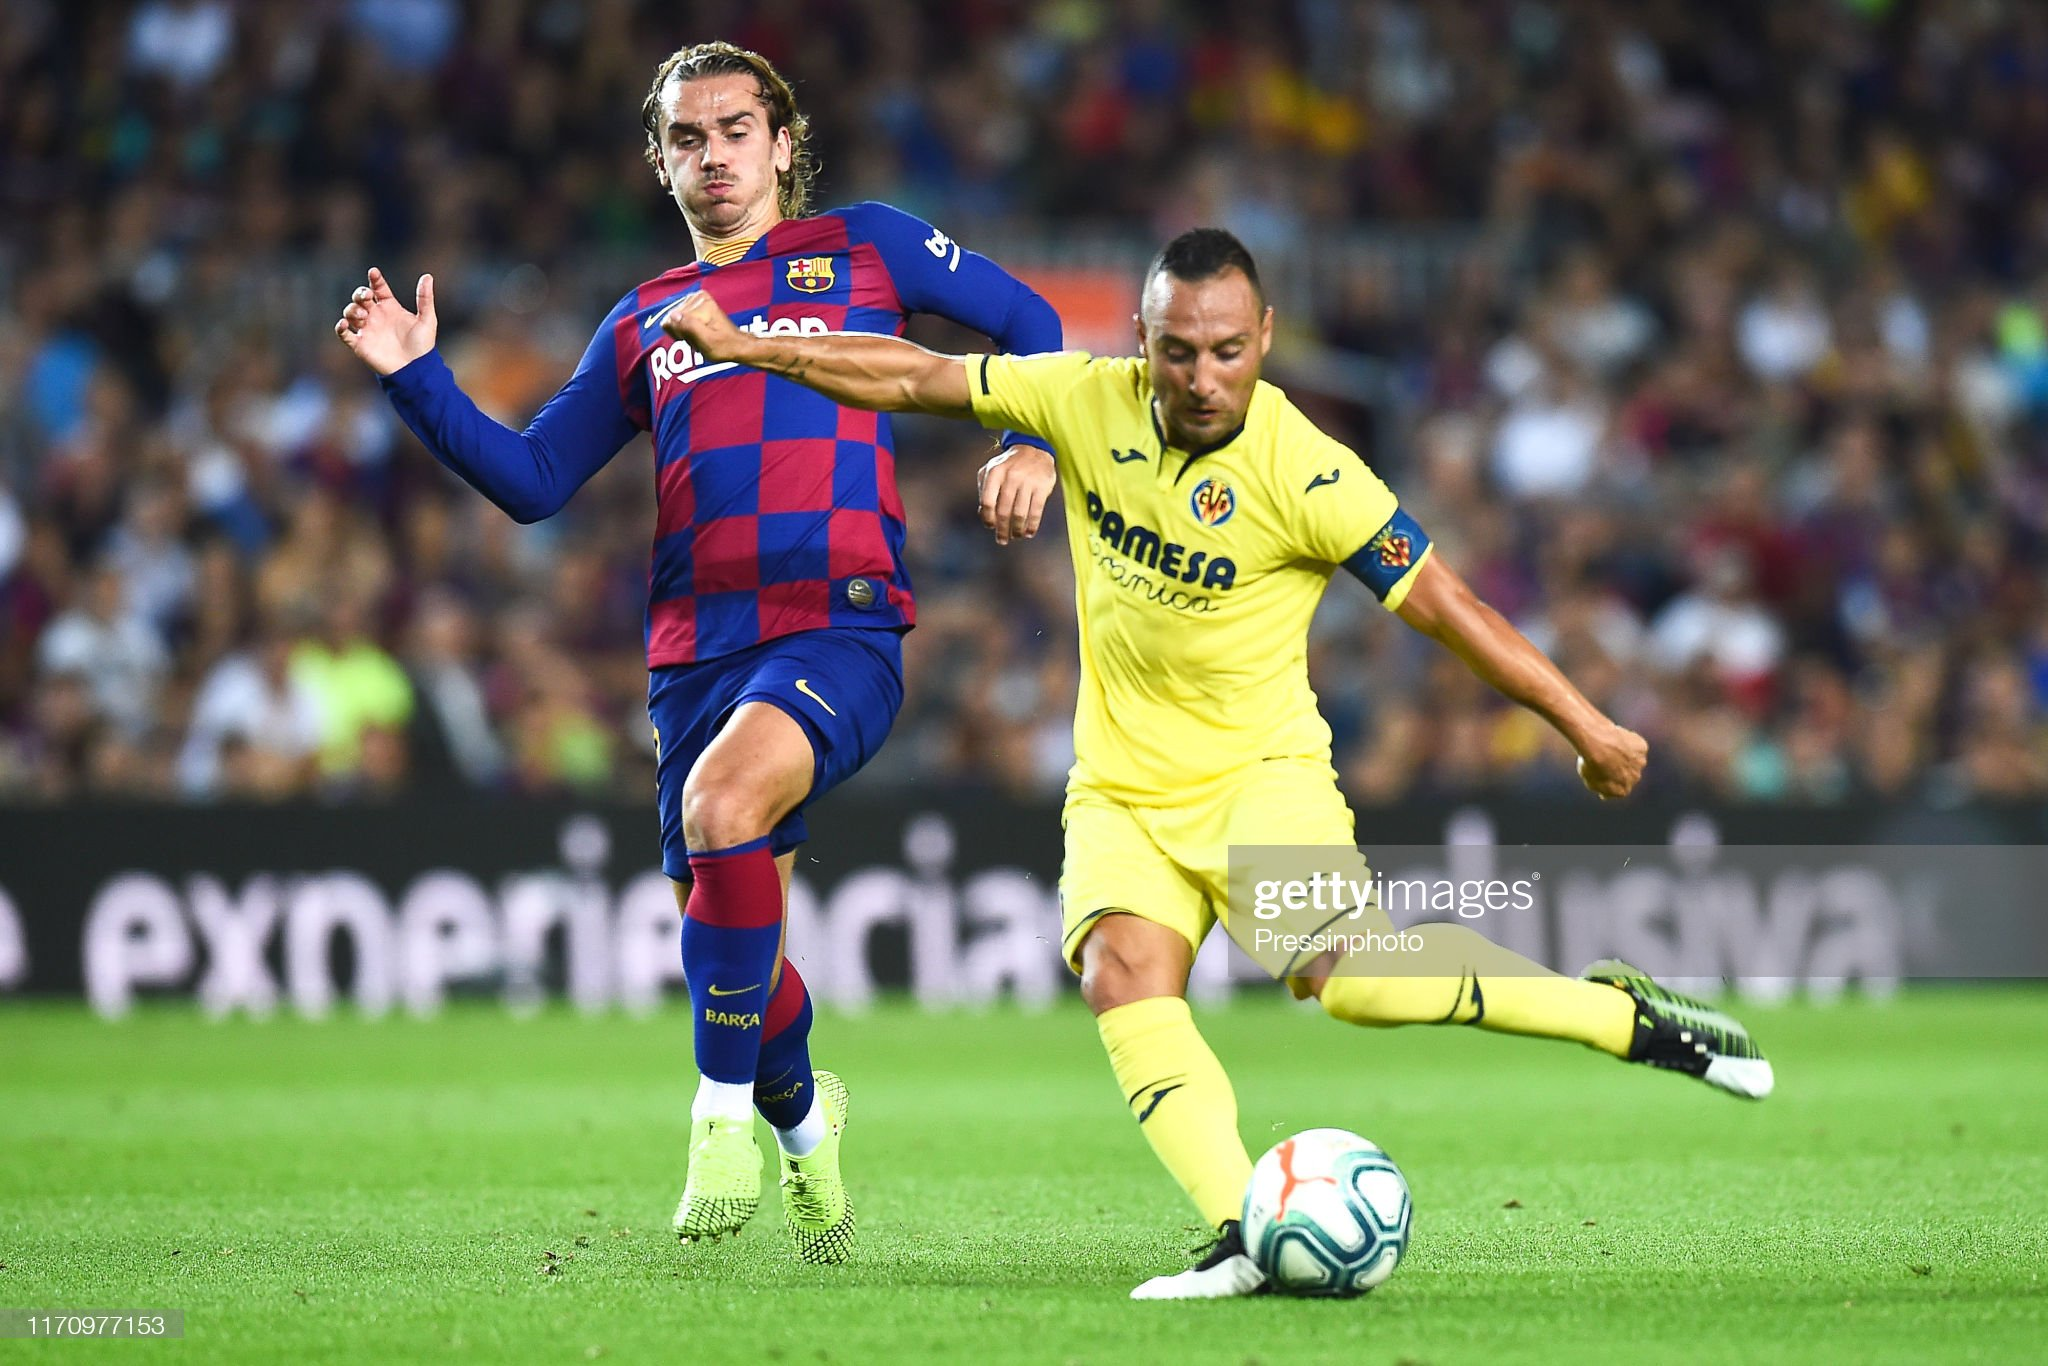 صور مباراة : برشلونة - فياريال 2-1 ( 24-09-2019 )  Santi-cazorla-of-villarreal-cf-scores-the-21-during-the-liga-match-picture-id1170977153?s=2048x2048